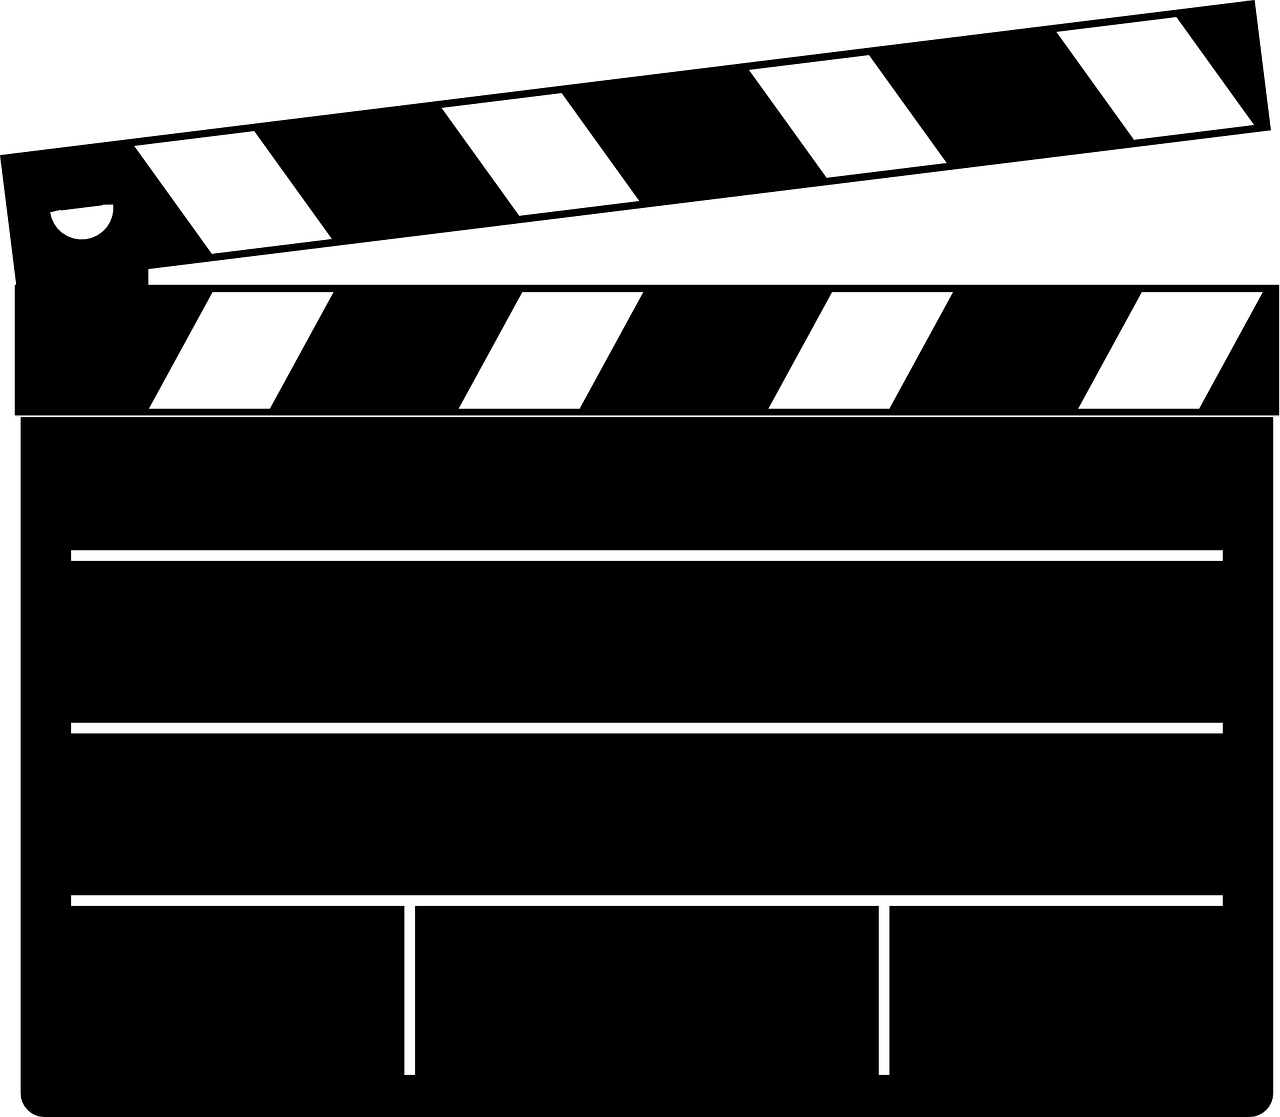 Film clipart filmmaking. Aboriginal filmmakers films and